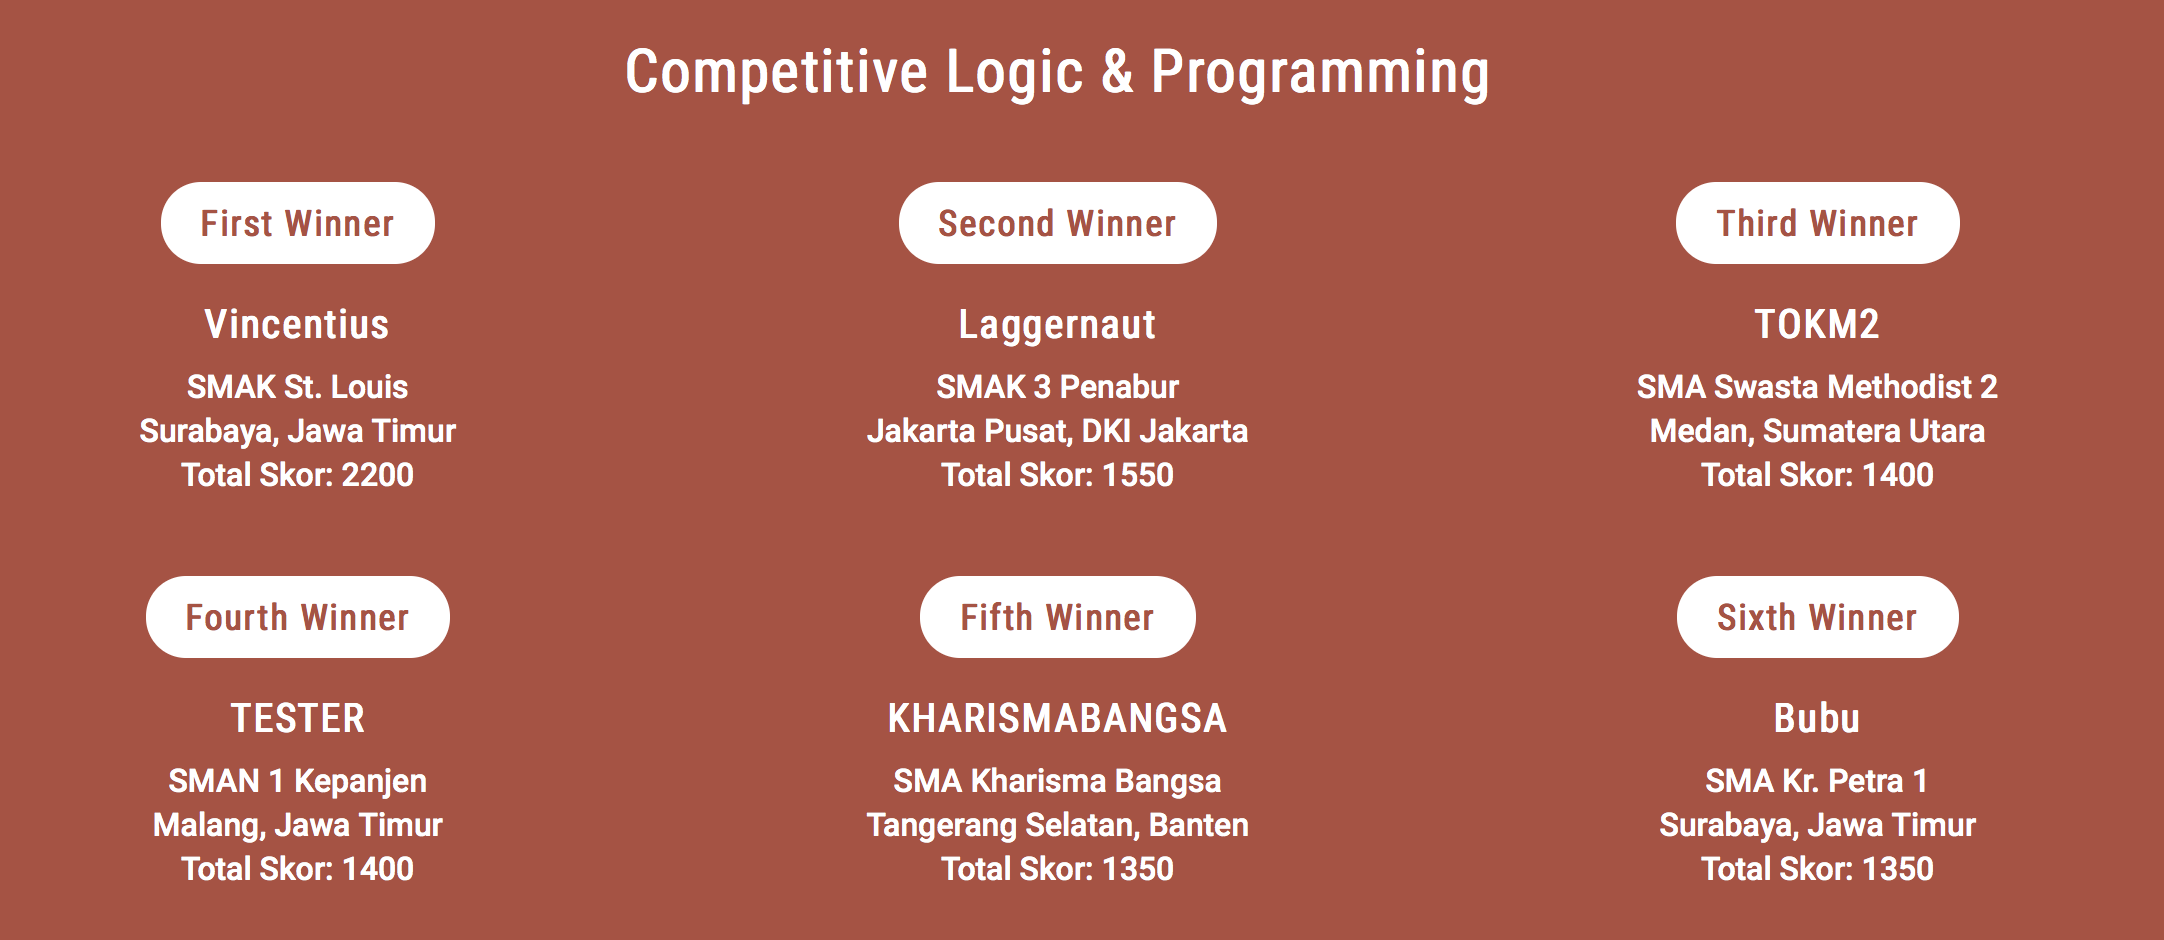 Pemenang Competitive Logic & Programming NPLC 2016